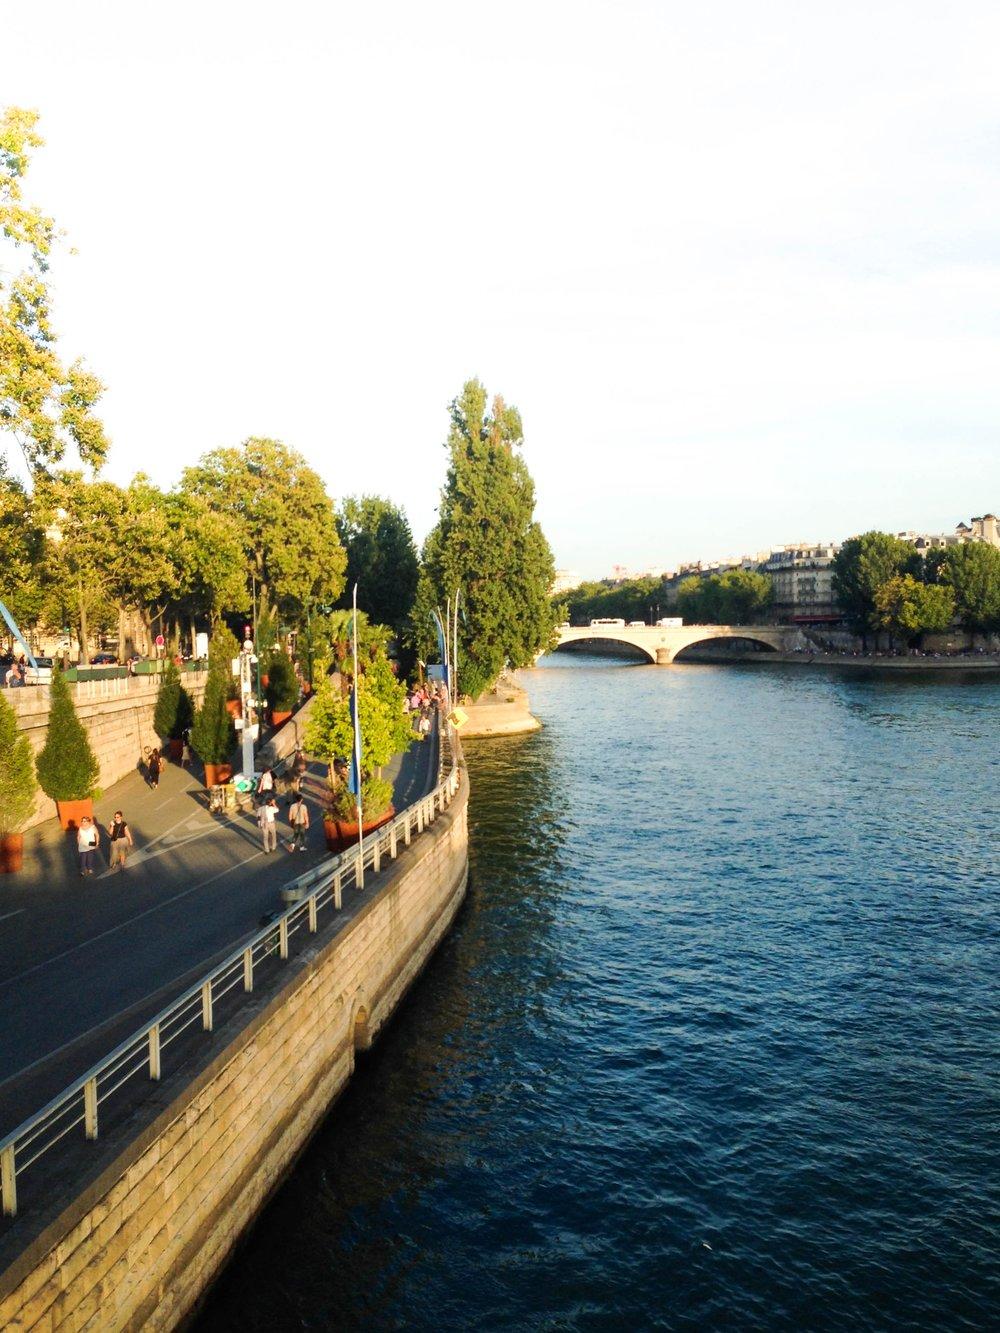 Along the Seine in Paris, France